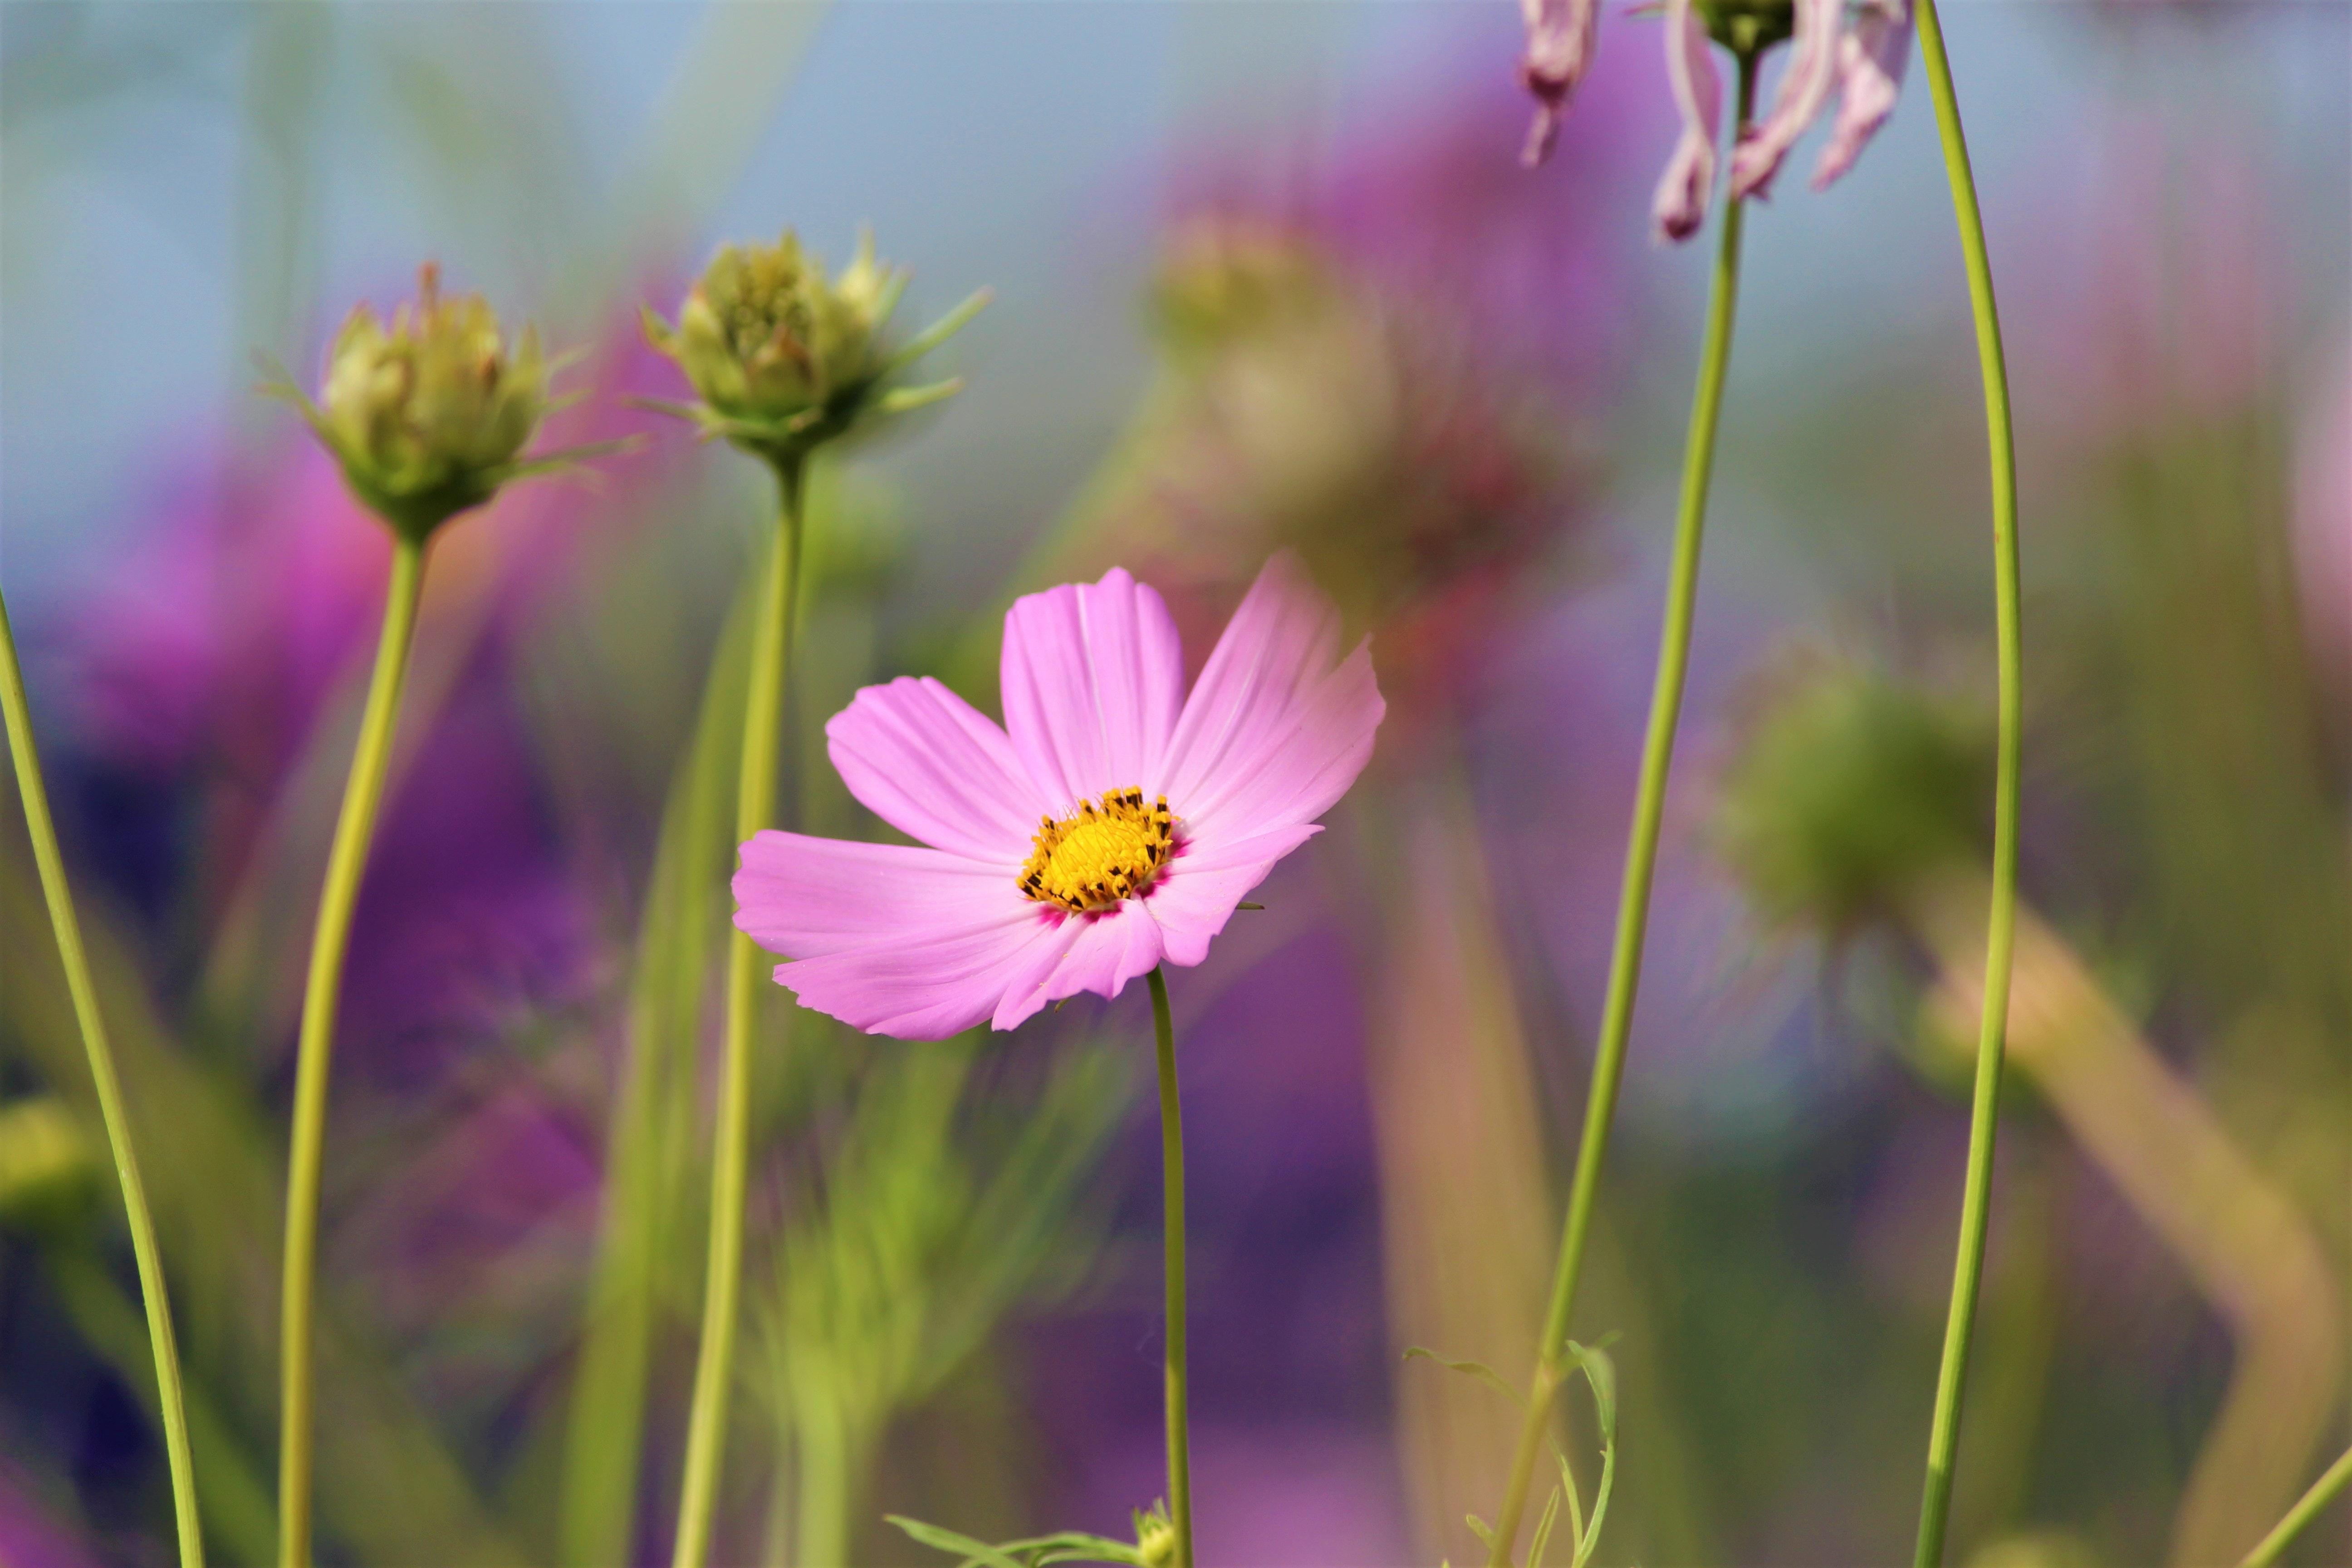 Shallow Focus Photography of Pink Flower, Beautiful, Grass, Summer, Stems, HQ Photo